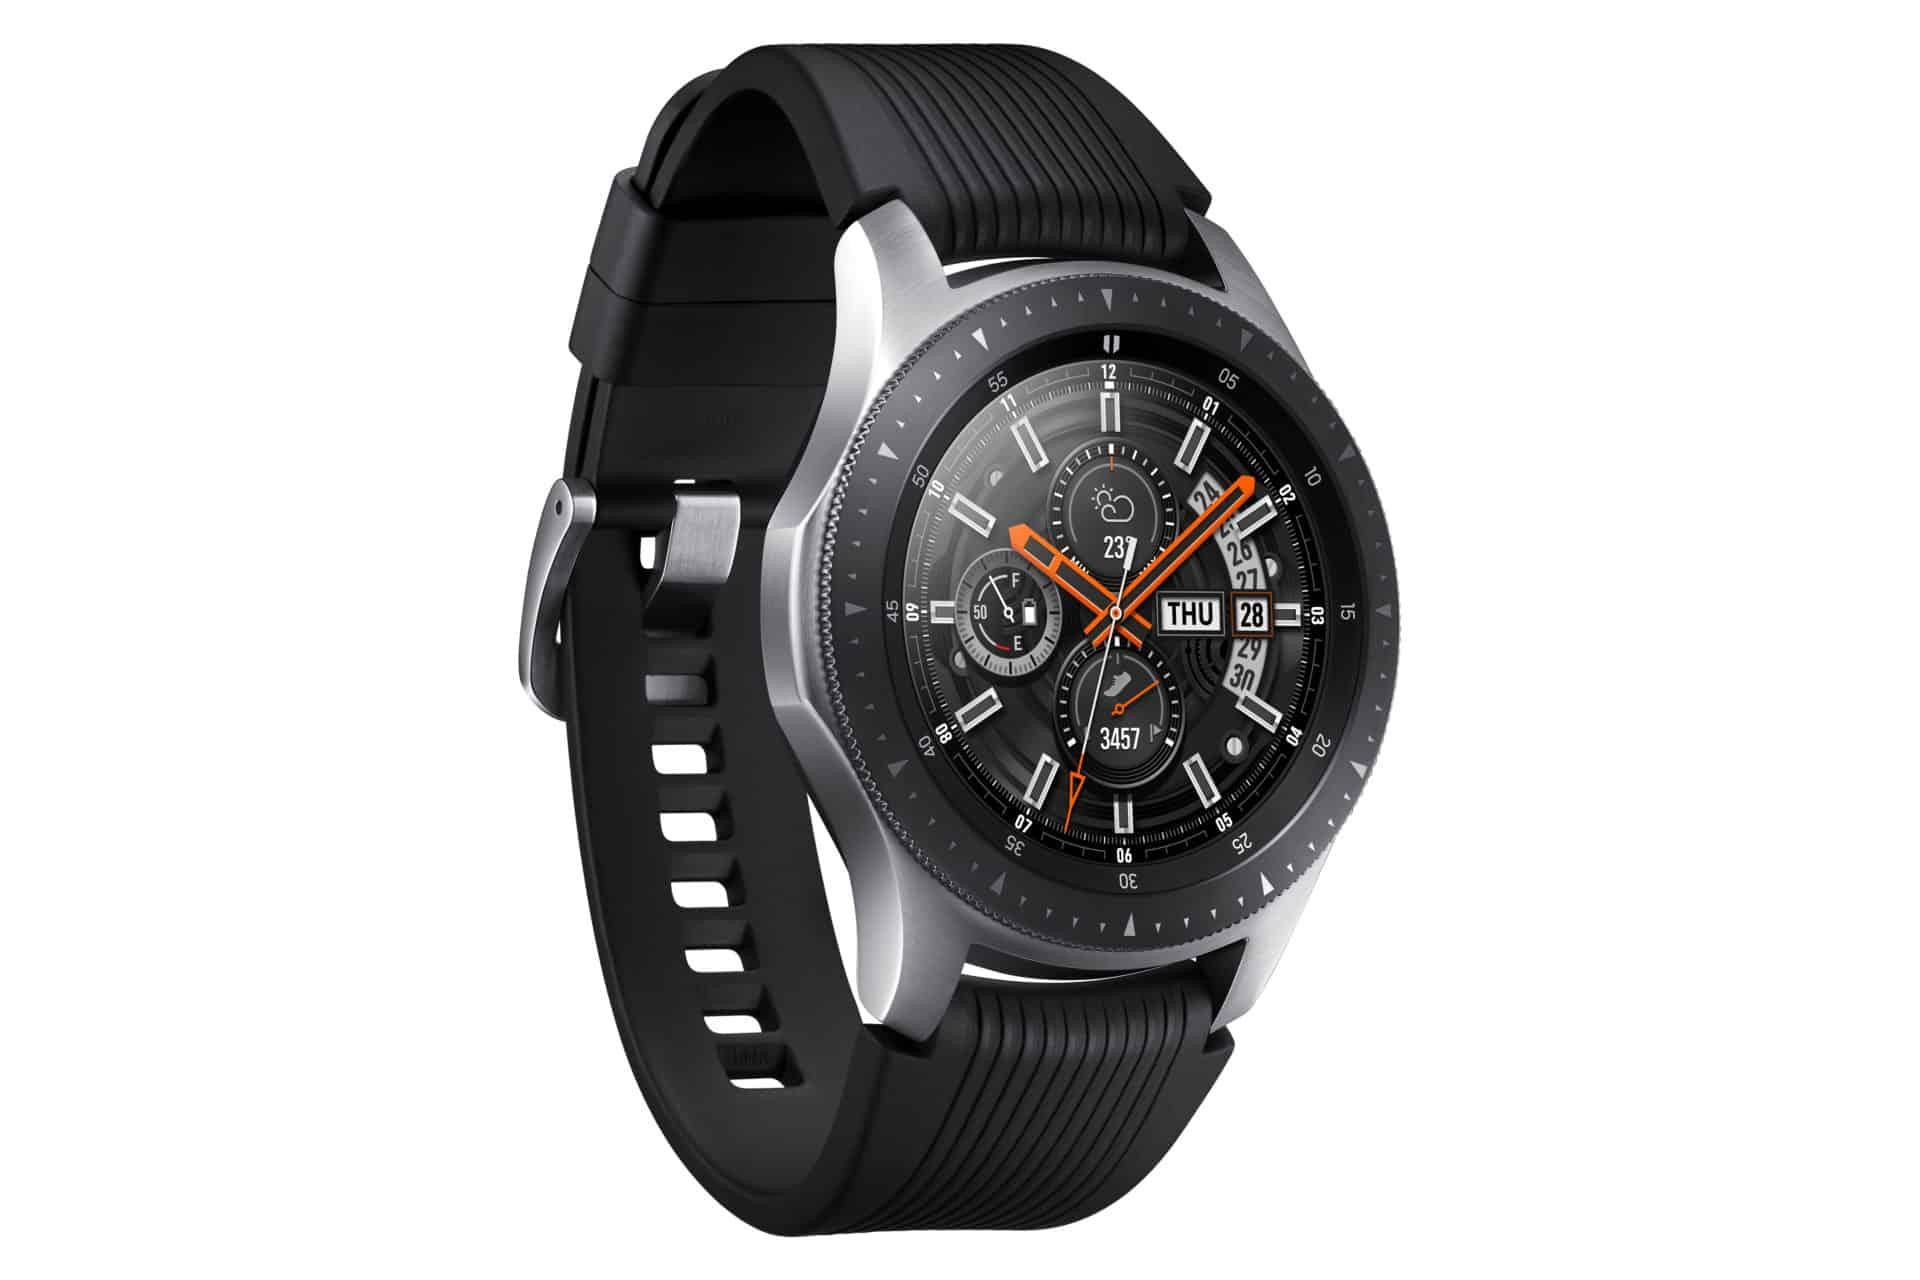 Skvělá vydrž baterie, wellness funkce a design: Samsung Galaxy Watch